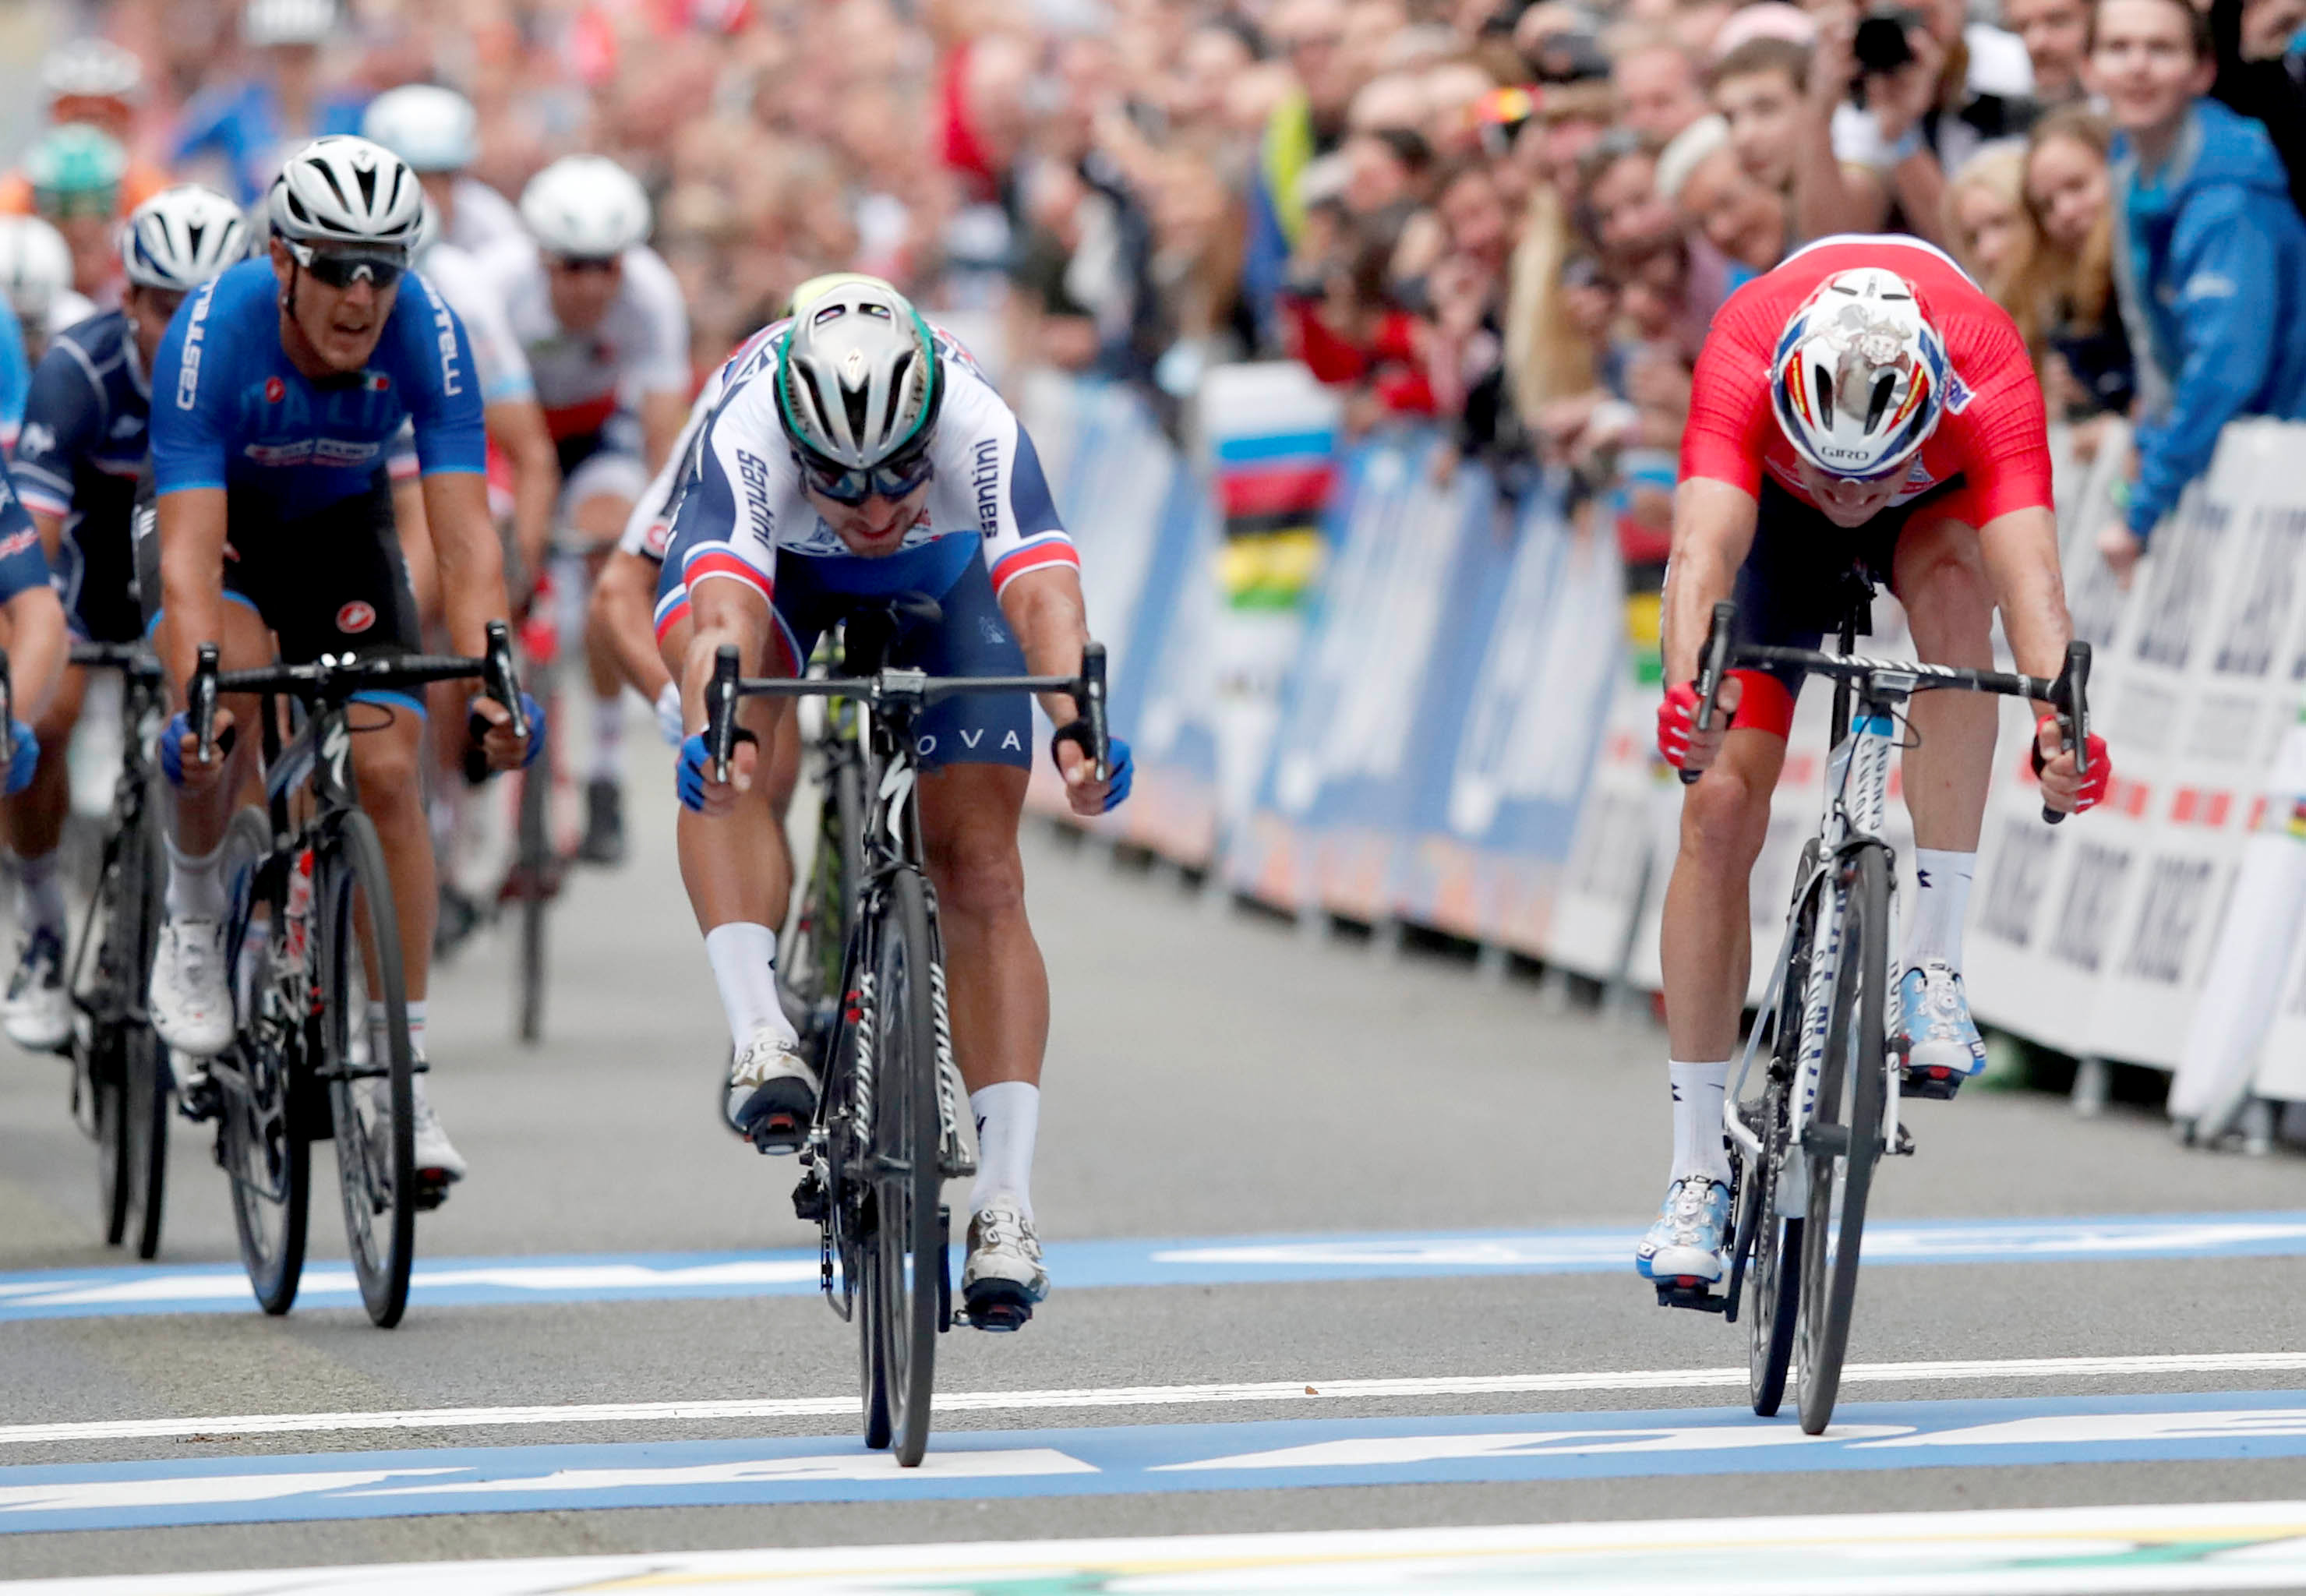 Cyclisme - Sagan, Sagan, Sagan: l'arc-en-ciel a un nom